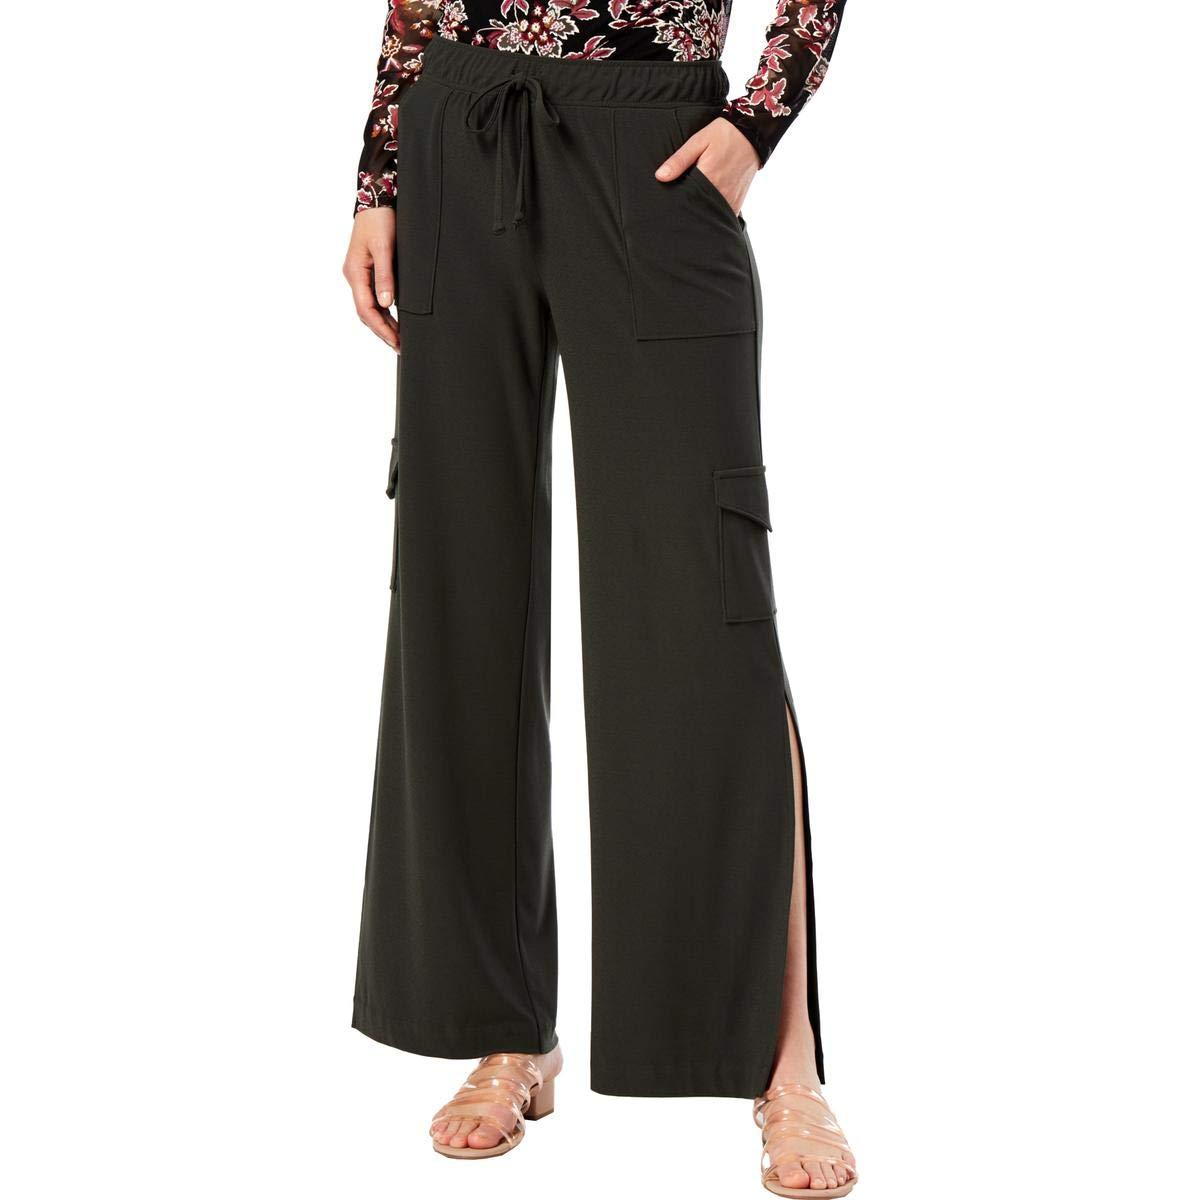 INC Womens Petites Regular Fit Cargo Wide Leg Pants Green PS